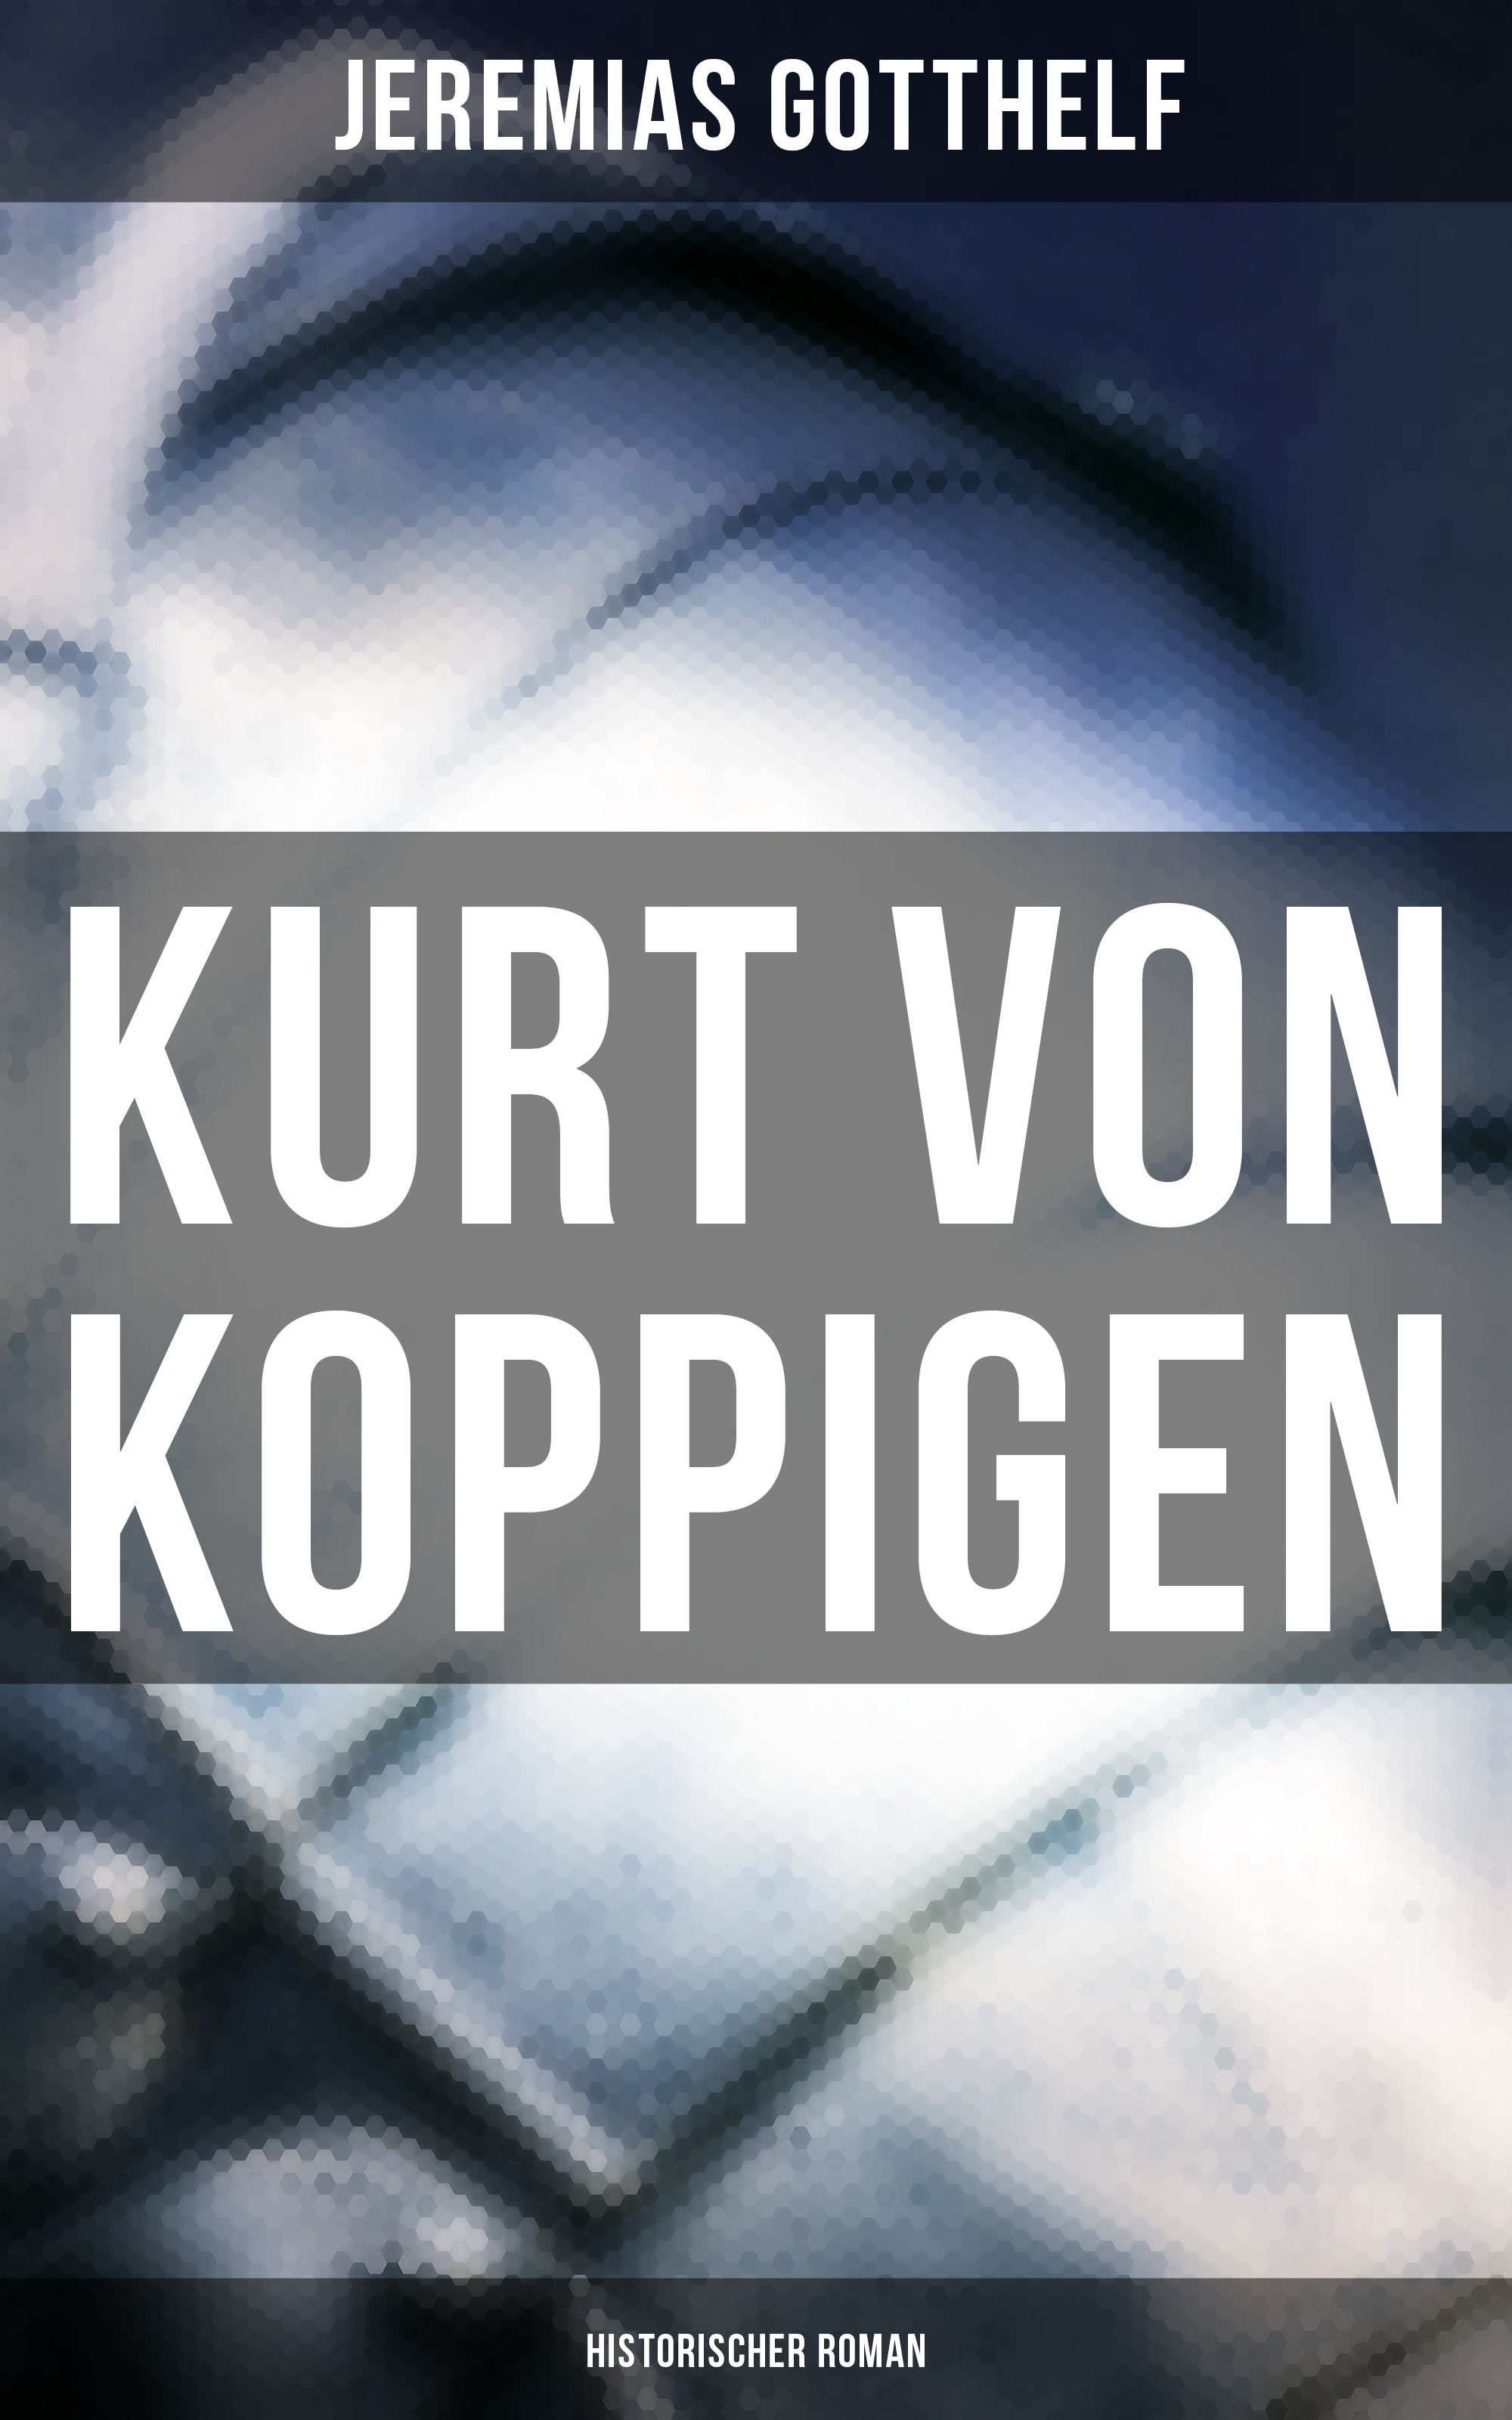 Jeremias Gotthelf Kurt von Koppigen (Historischer Roman) радищев а н а н радищев избранные сочинения